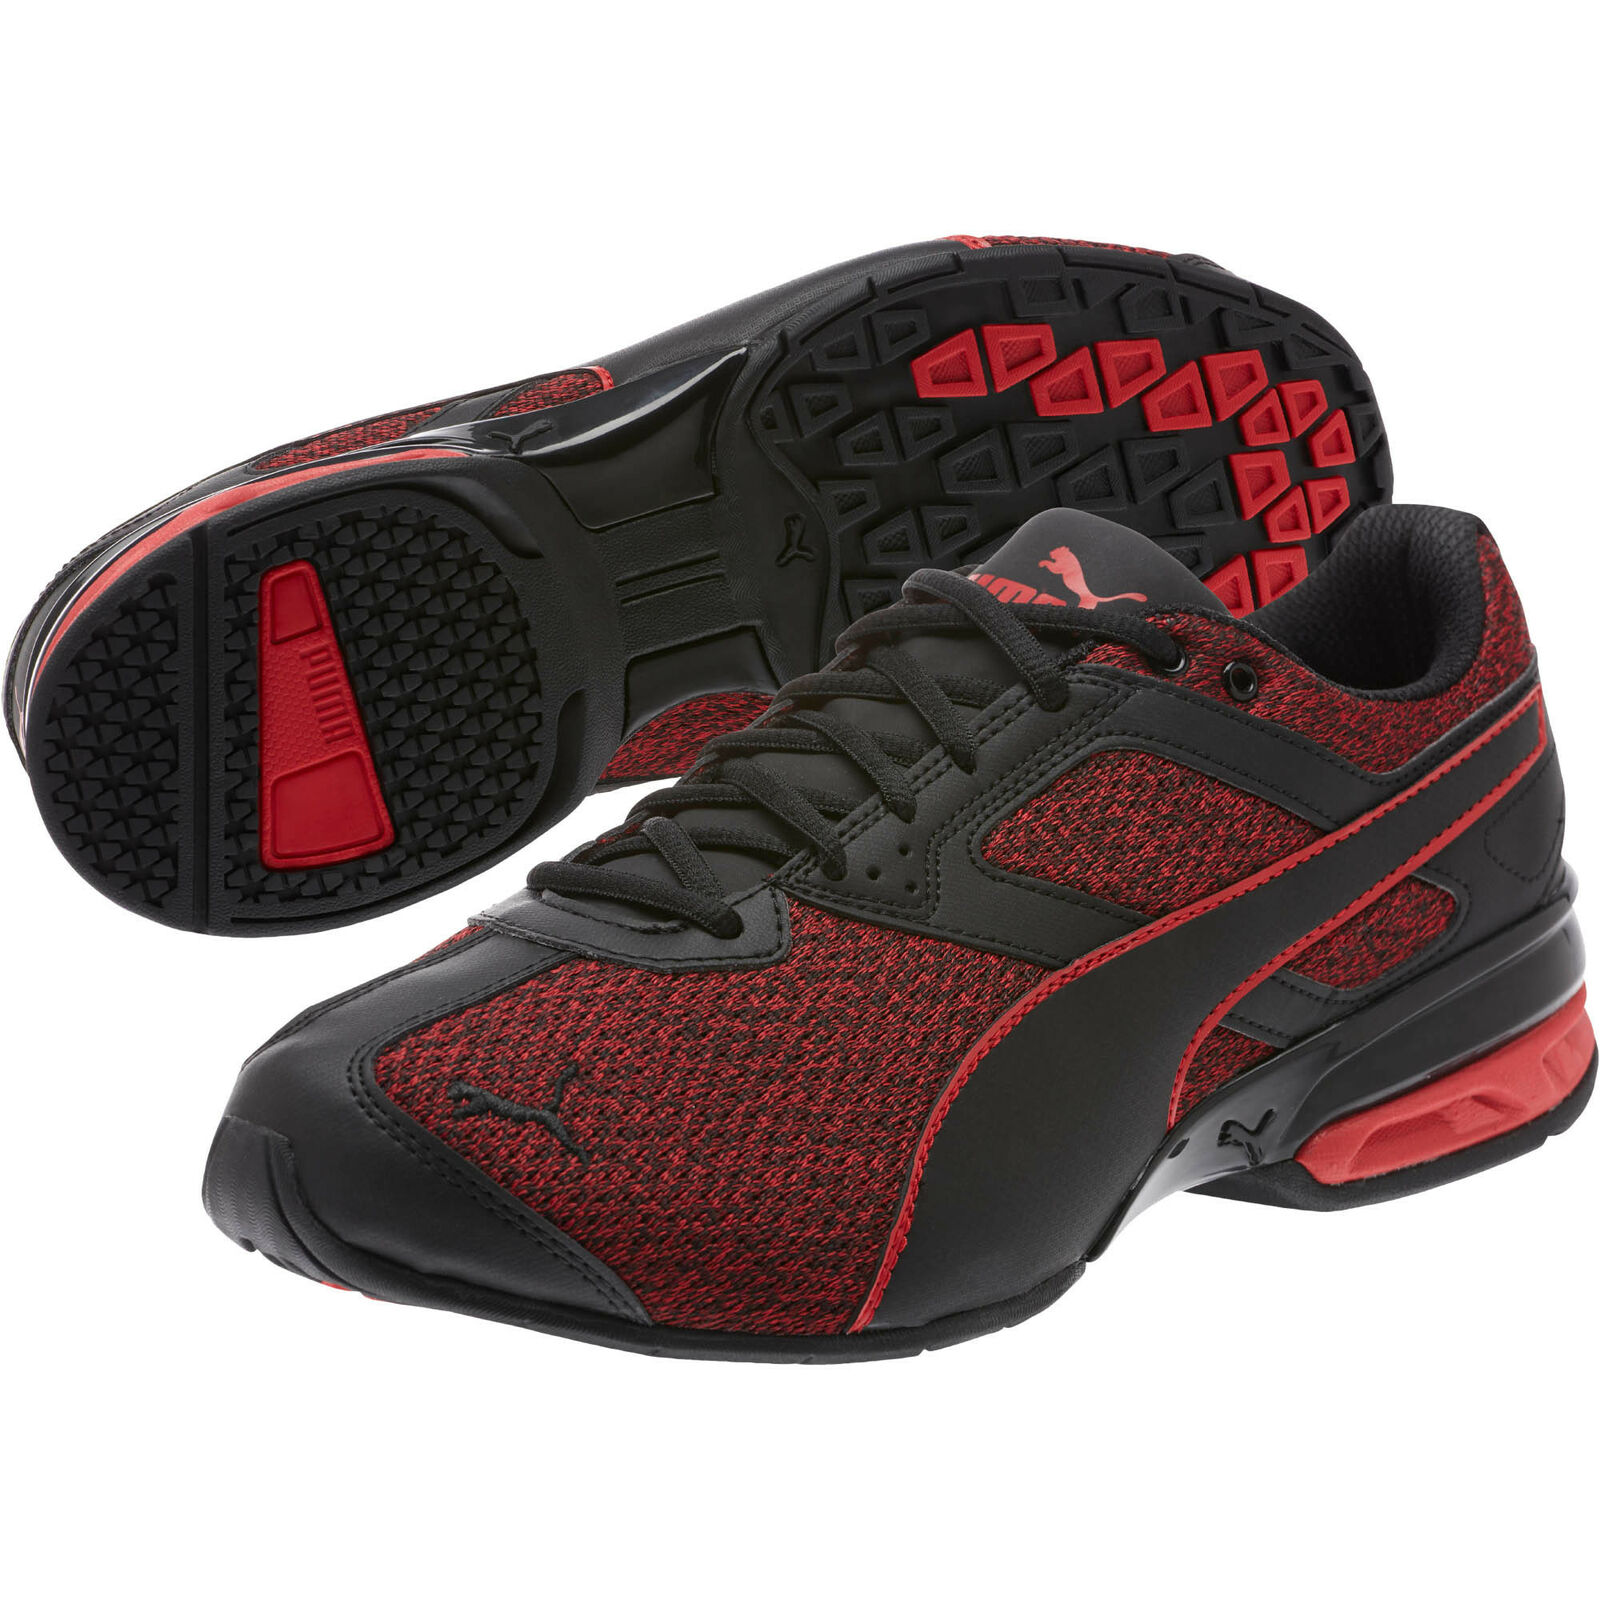 PUMA Tazon 6 Knit Men's Sneakers Men